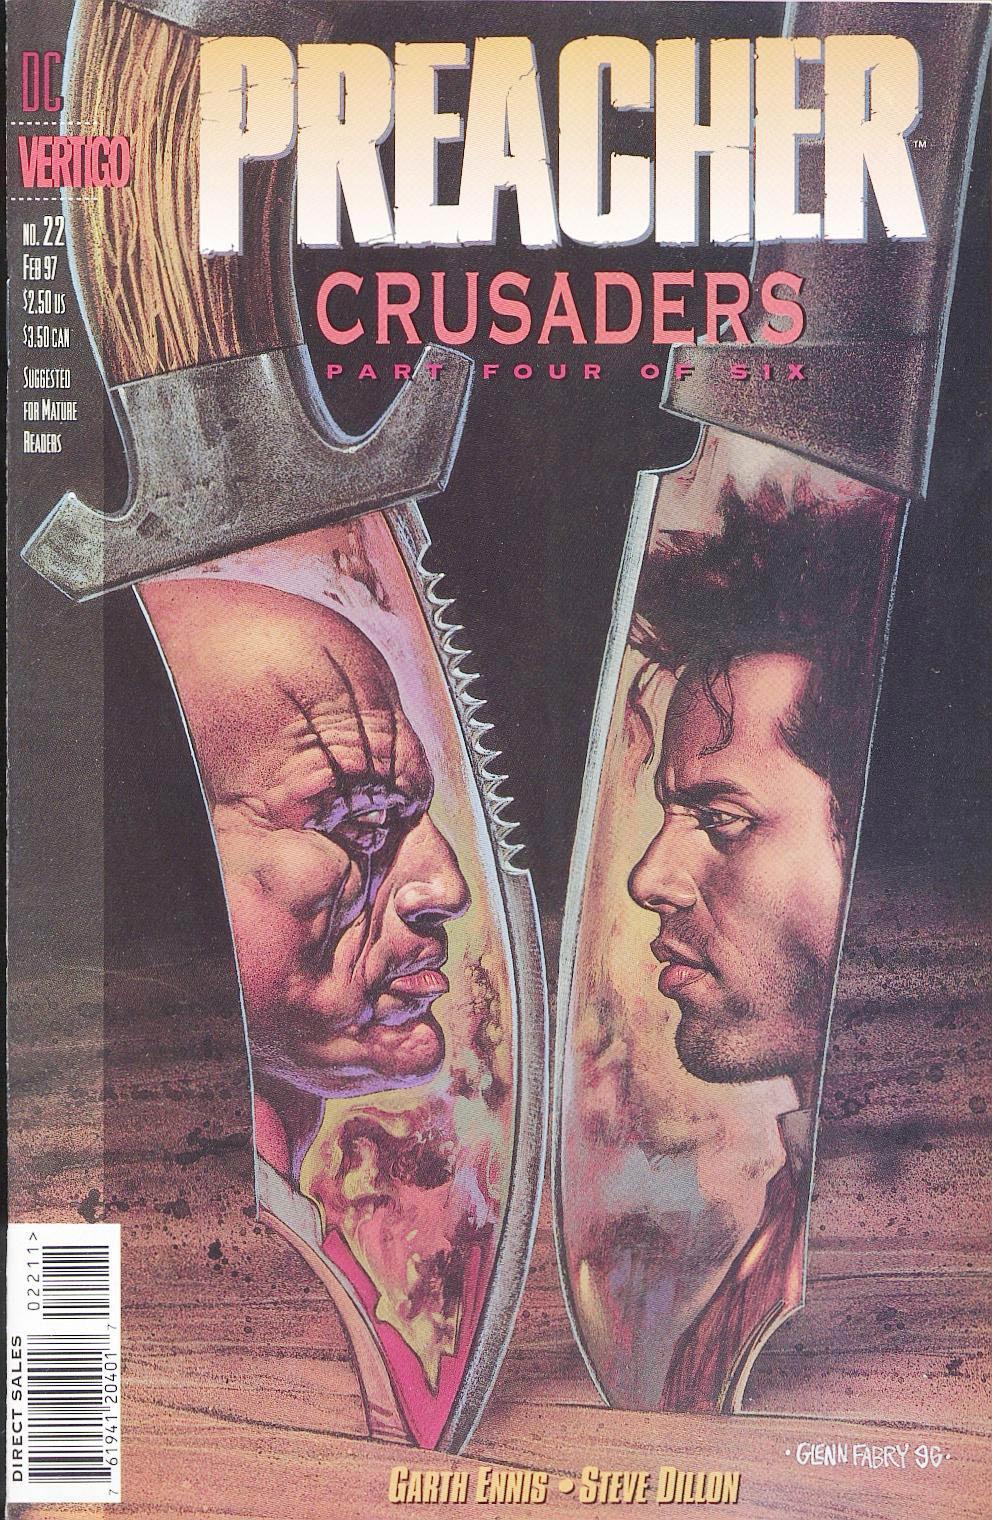 Комиксы Онлайн - Проповедник - # 22 - Страница №1 - Preacher - Preacher # 22